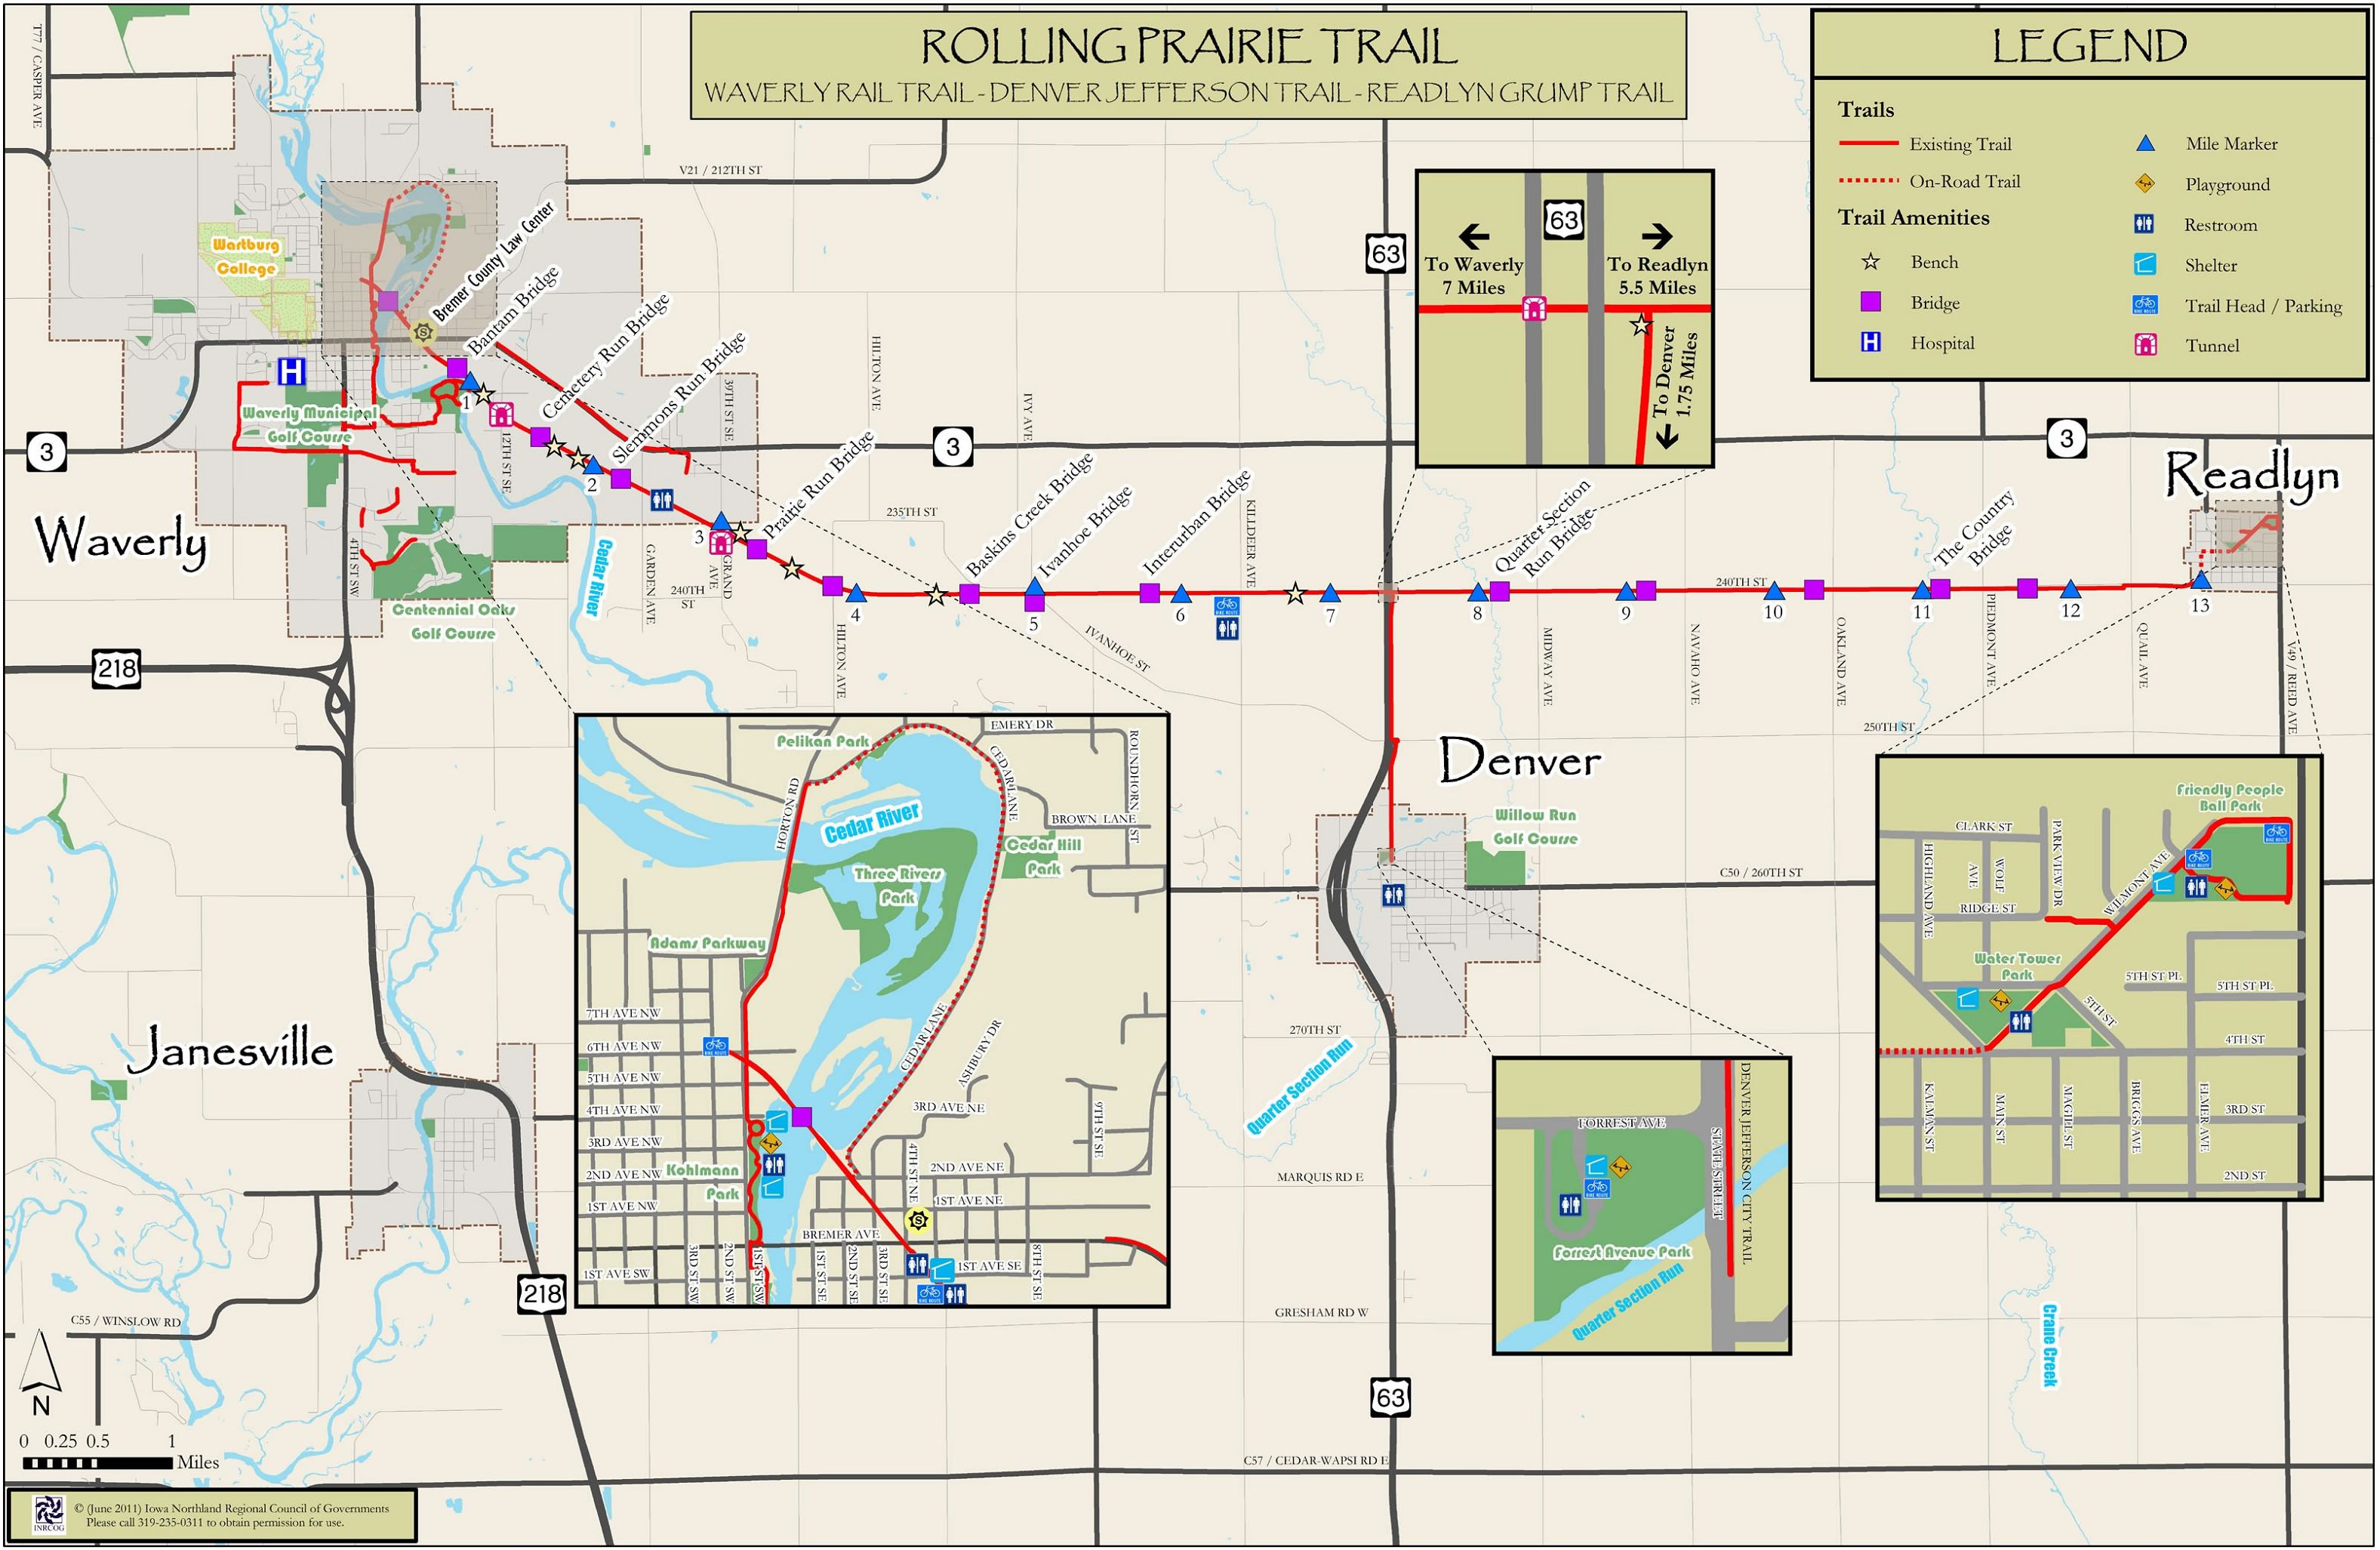 Waverly Rail Trail Iowa Tourism Map Travel Guide Things To Do - Us rail trail map